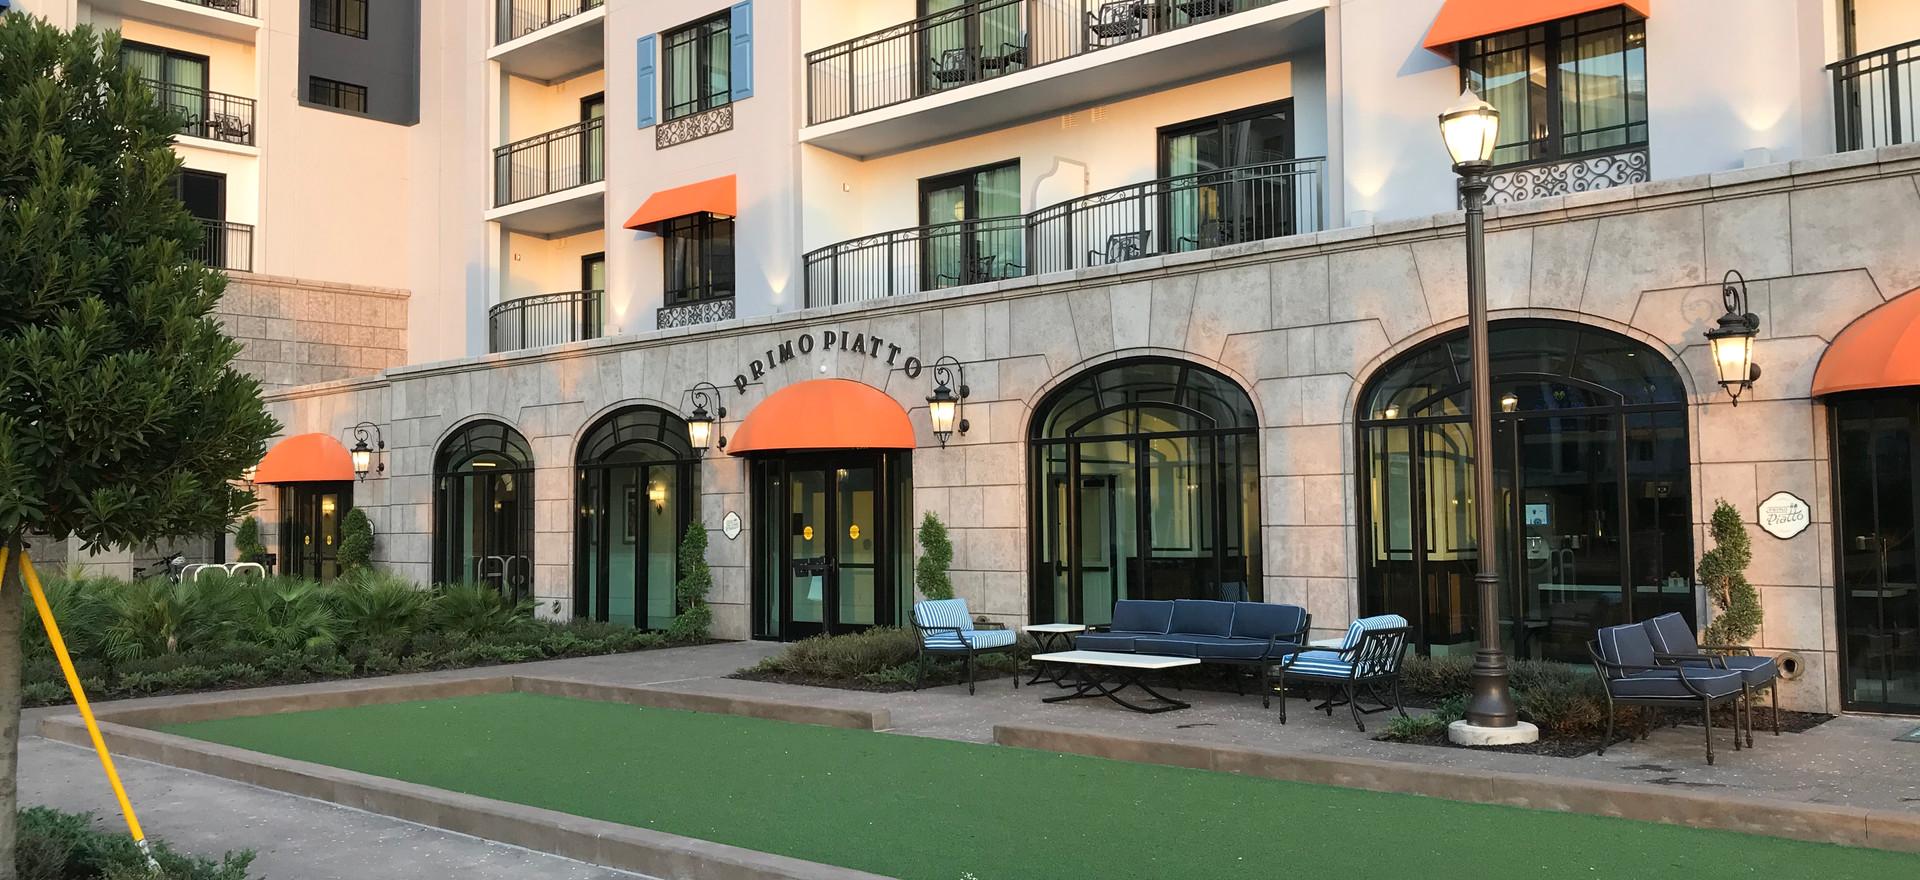 THEMED HOTEL